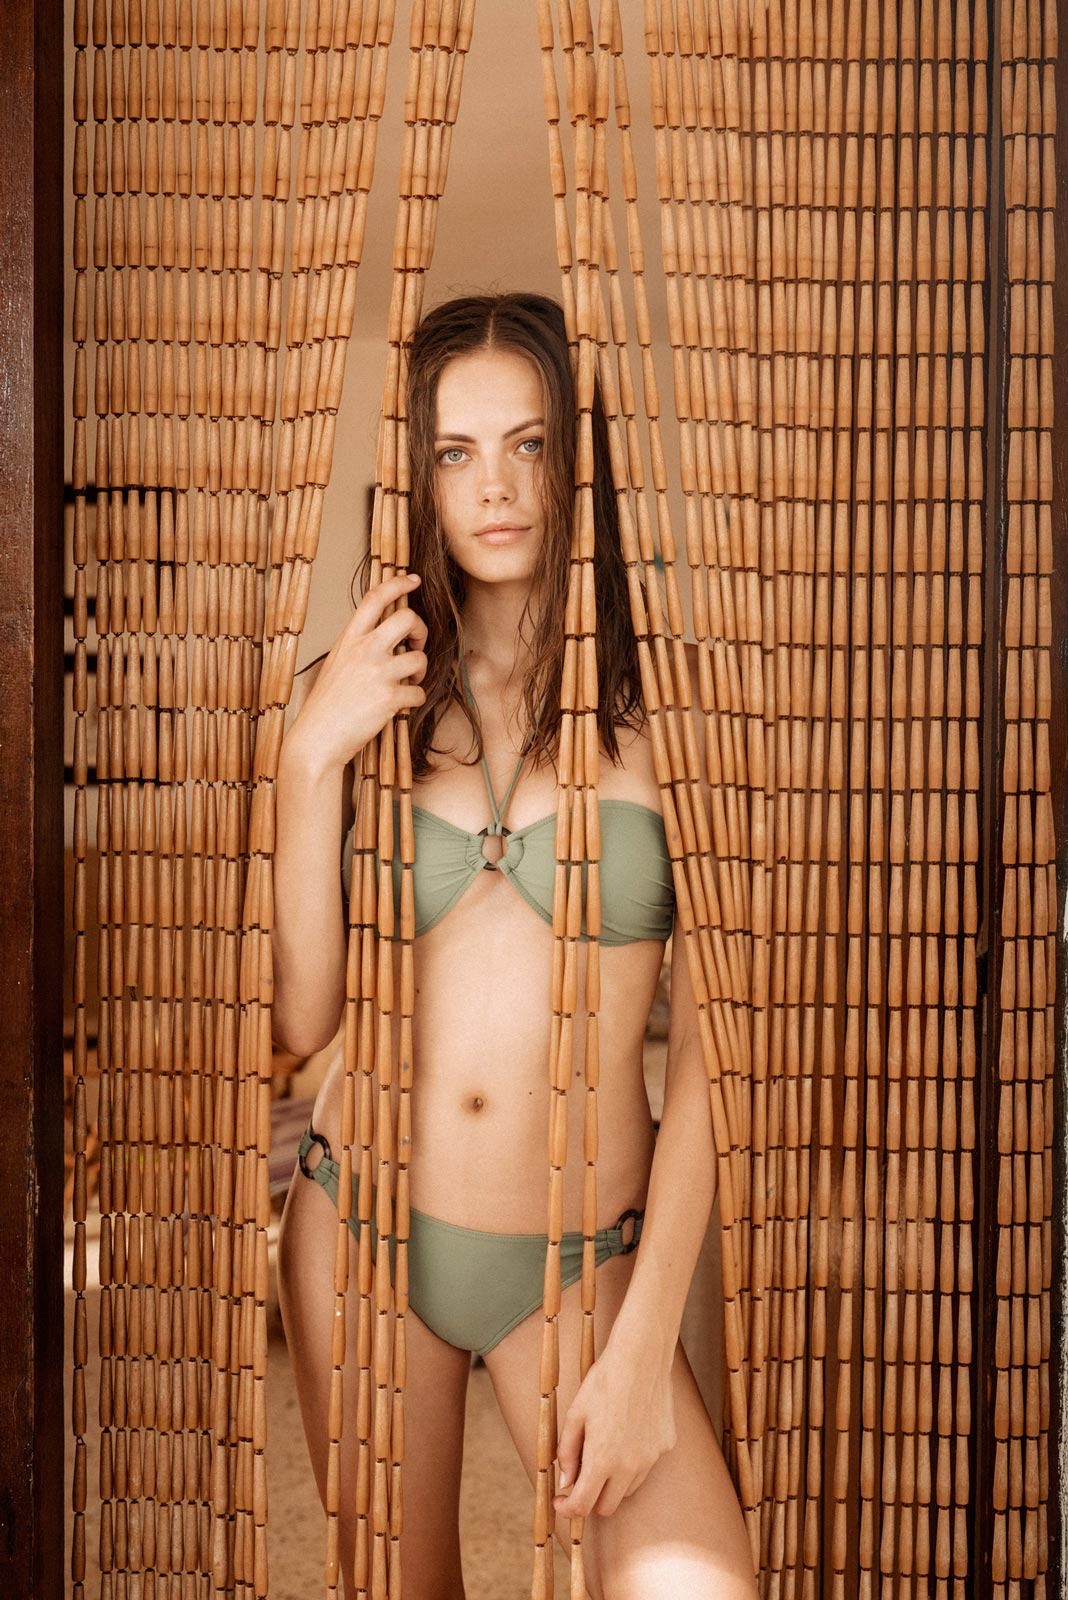 Vuma bikini Serengueti by RESET PRIORITY